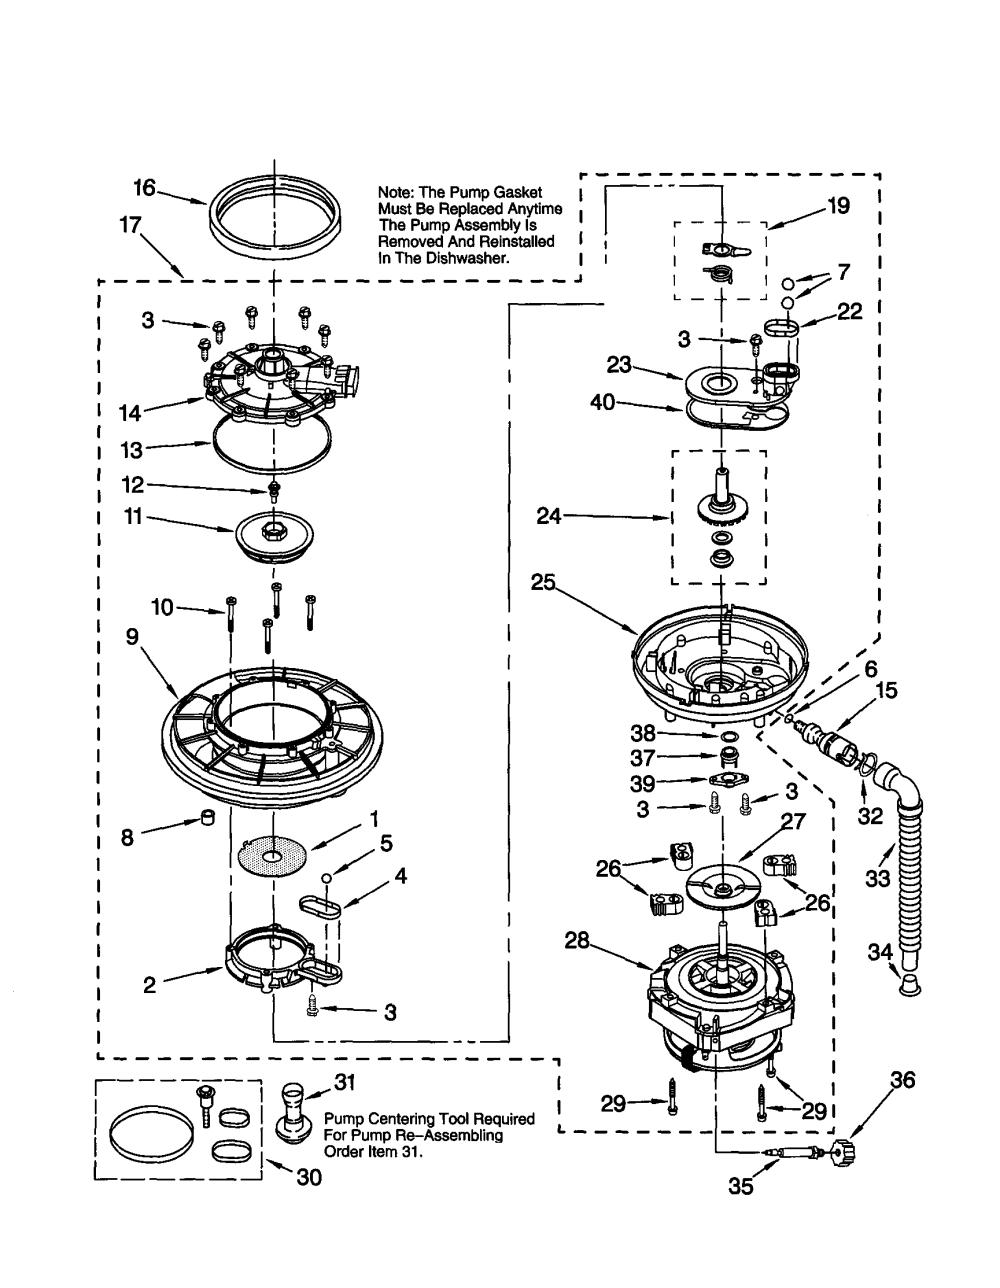 medium resolution of kenmore dishwasher schematic wiring diagram go kenmore dishwasher schematic kenmore dishwasher schematic